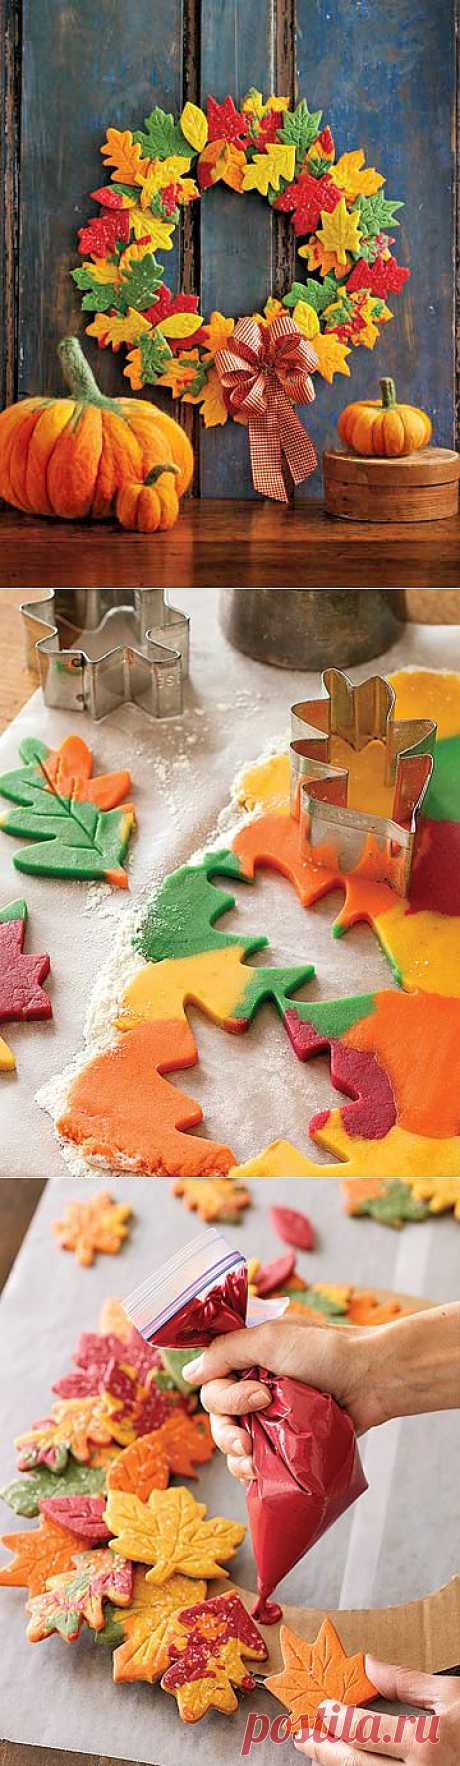 """Добро to welcome cookies and a wreath, Осень!"" | MAKE!"